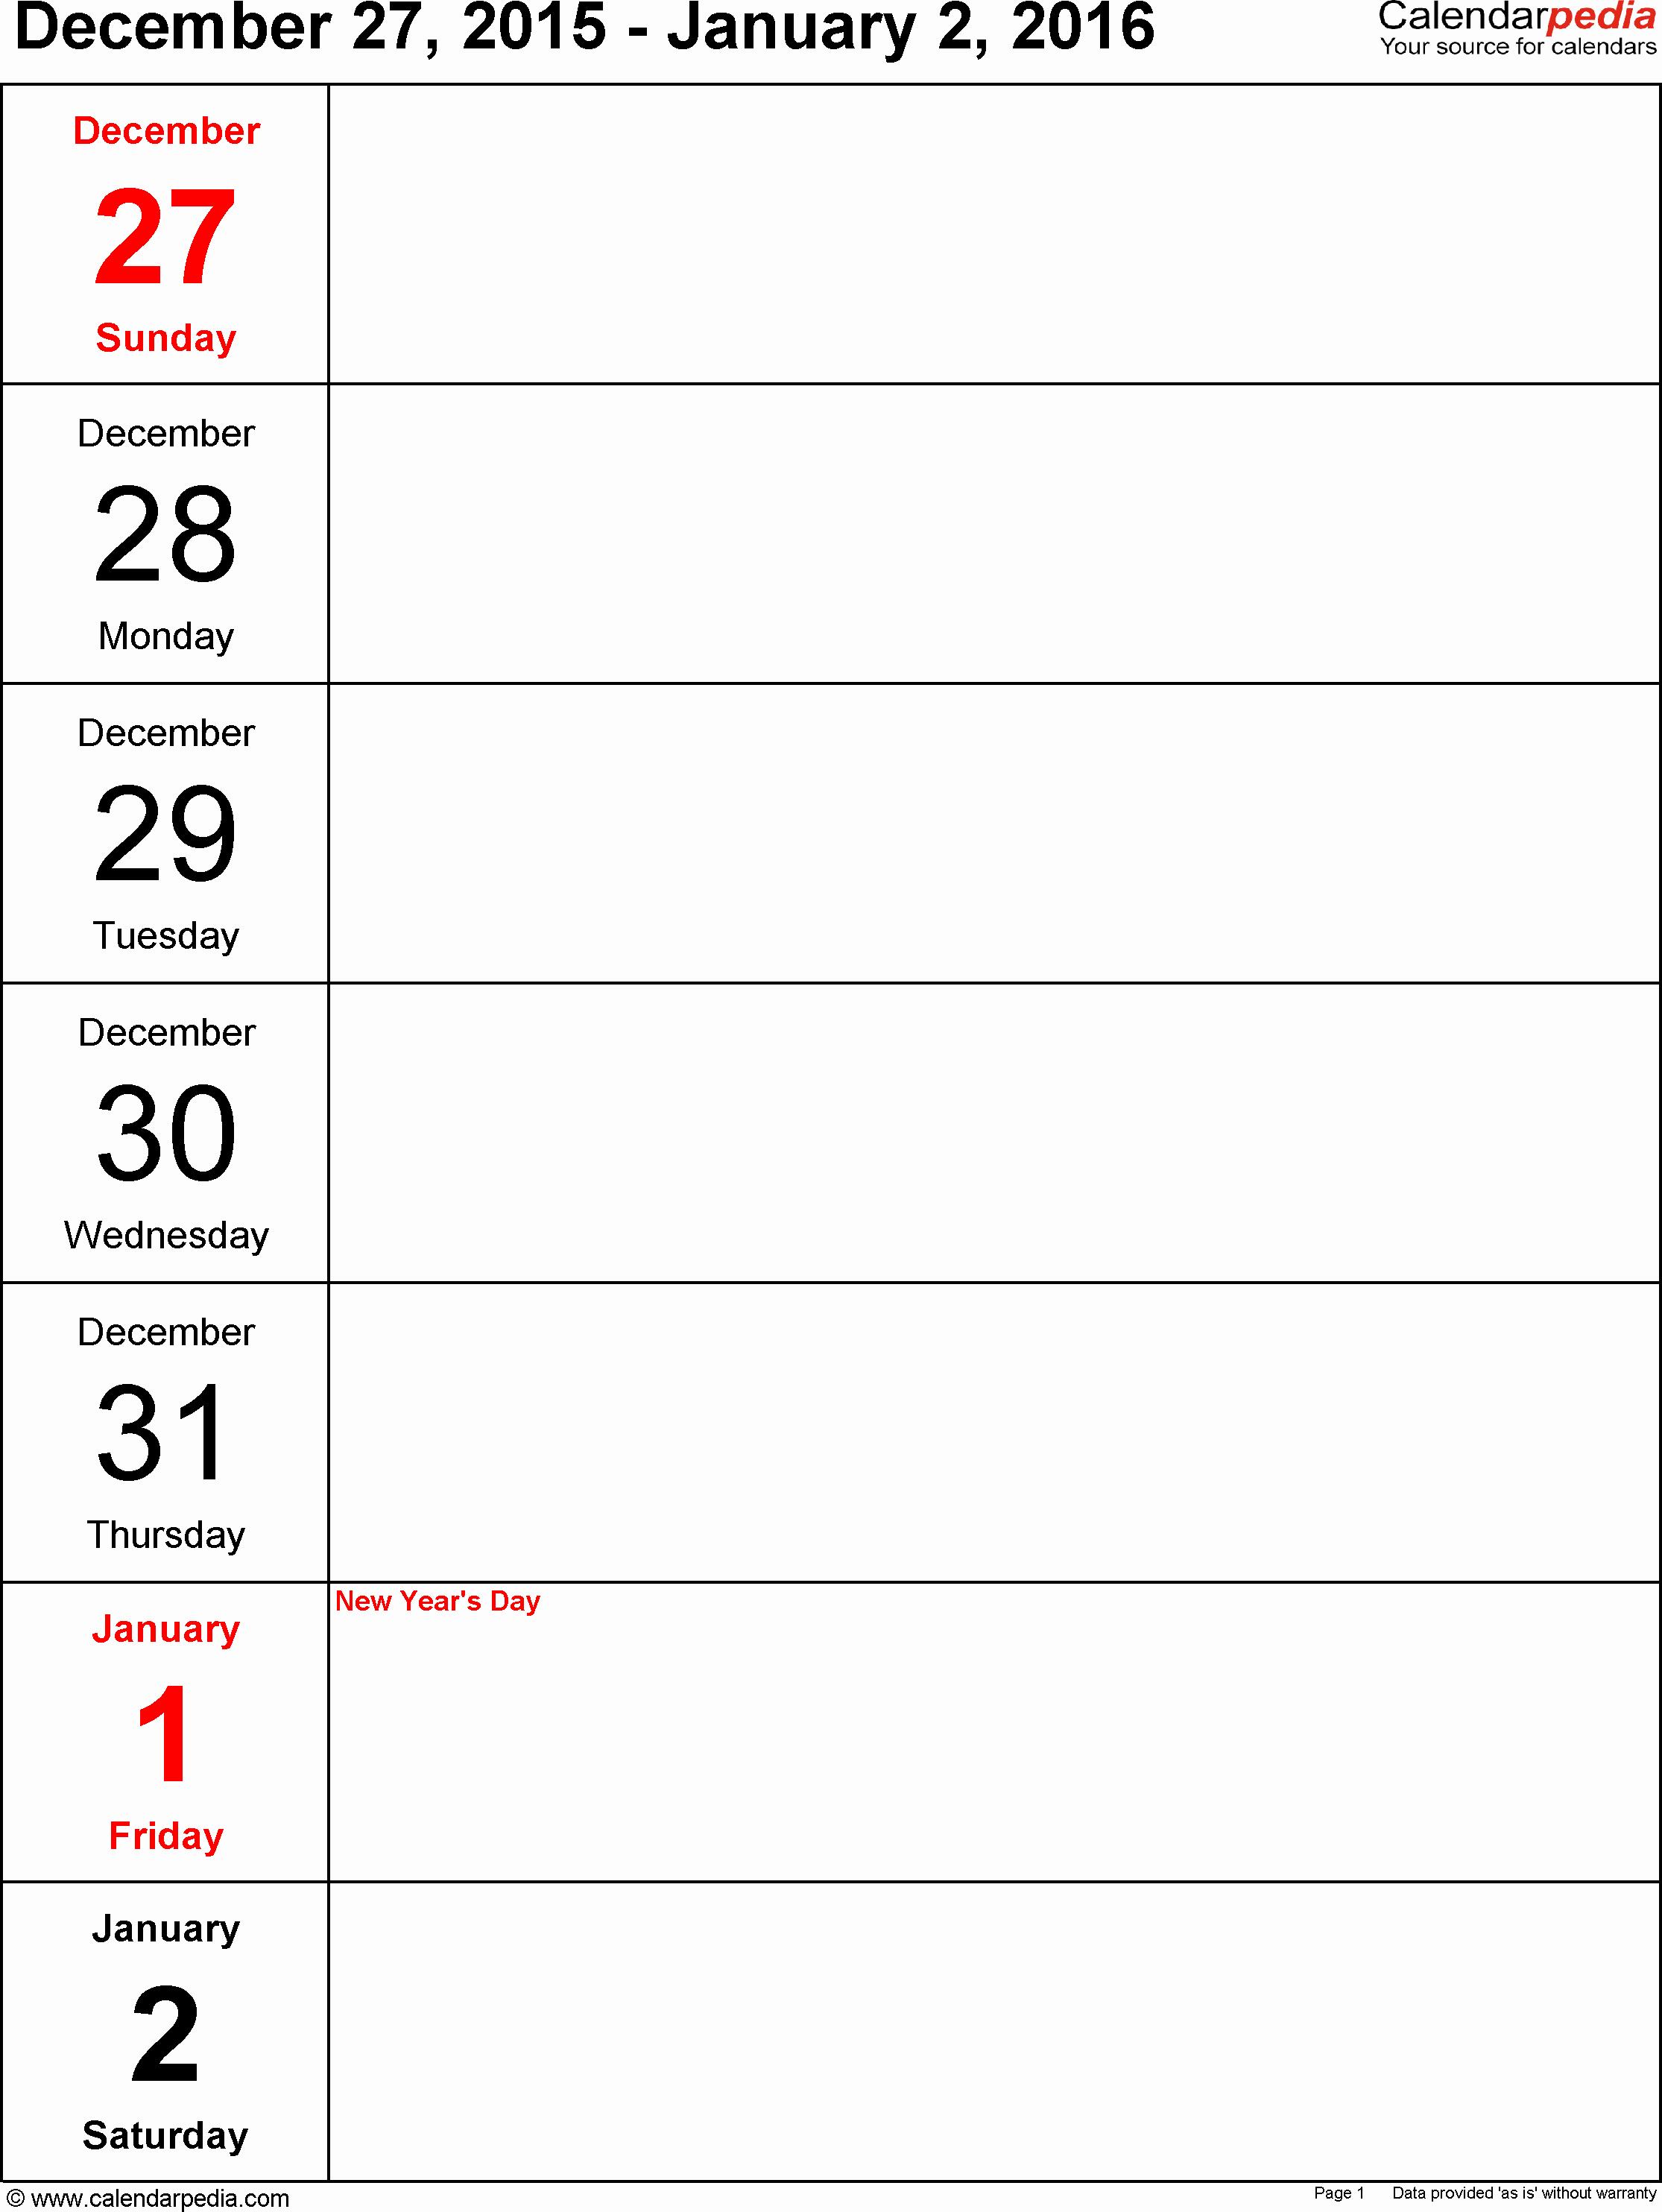 Microsoft Word Weekly Calendar Template Elegant Weekly Calendar 2016 for Word 12 Free Printable Templates